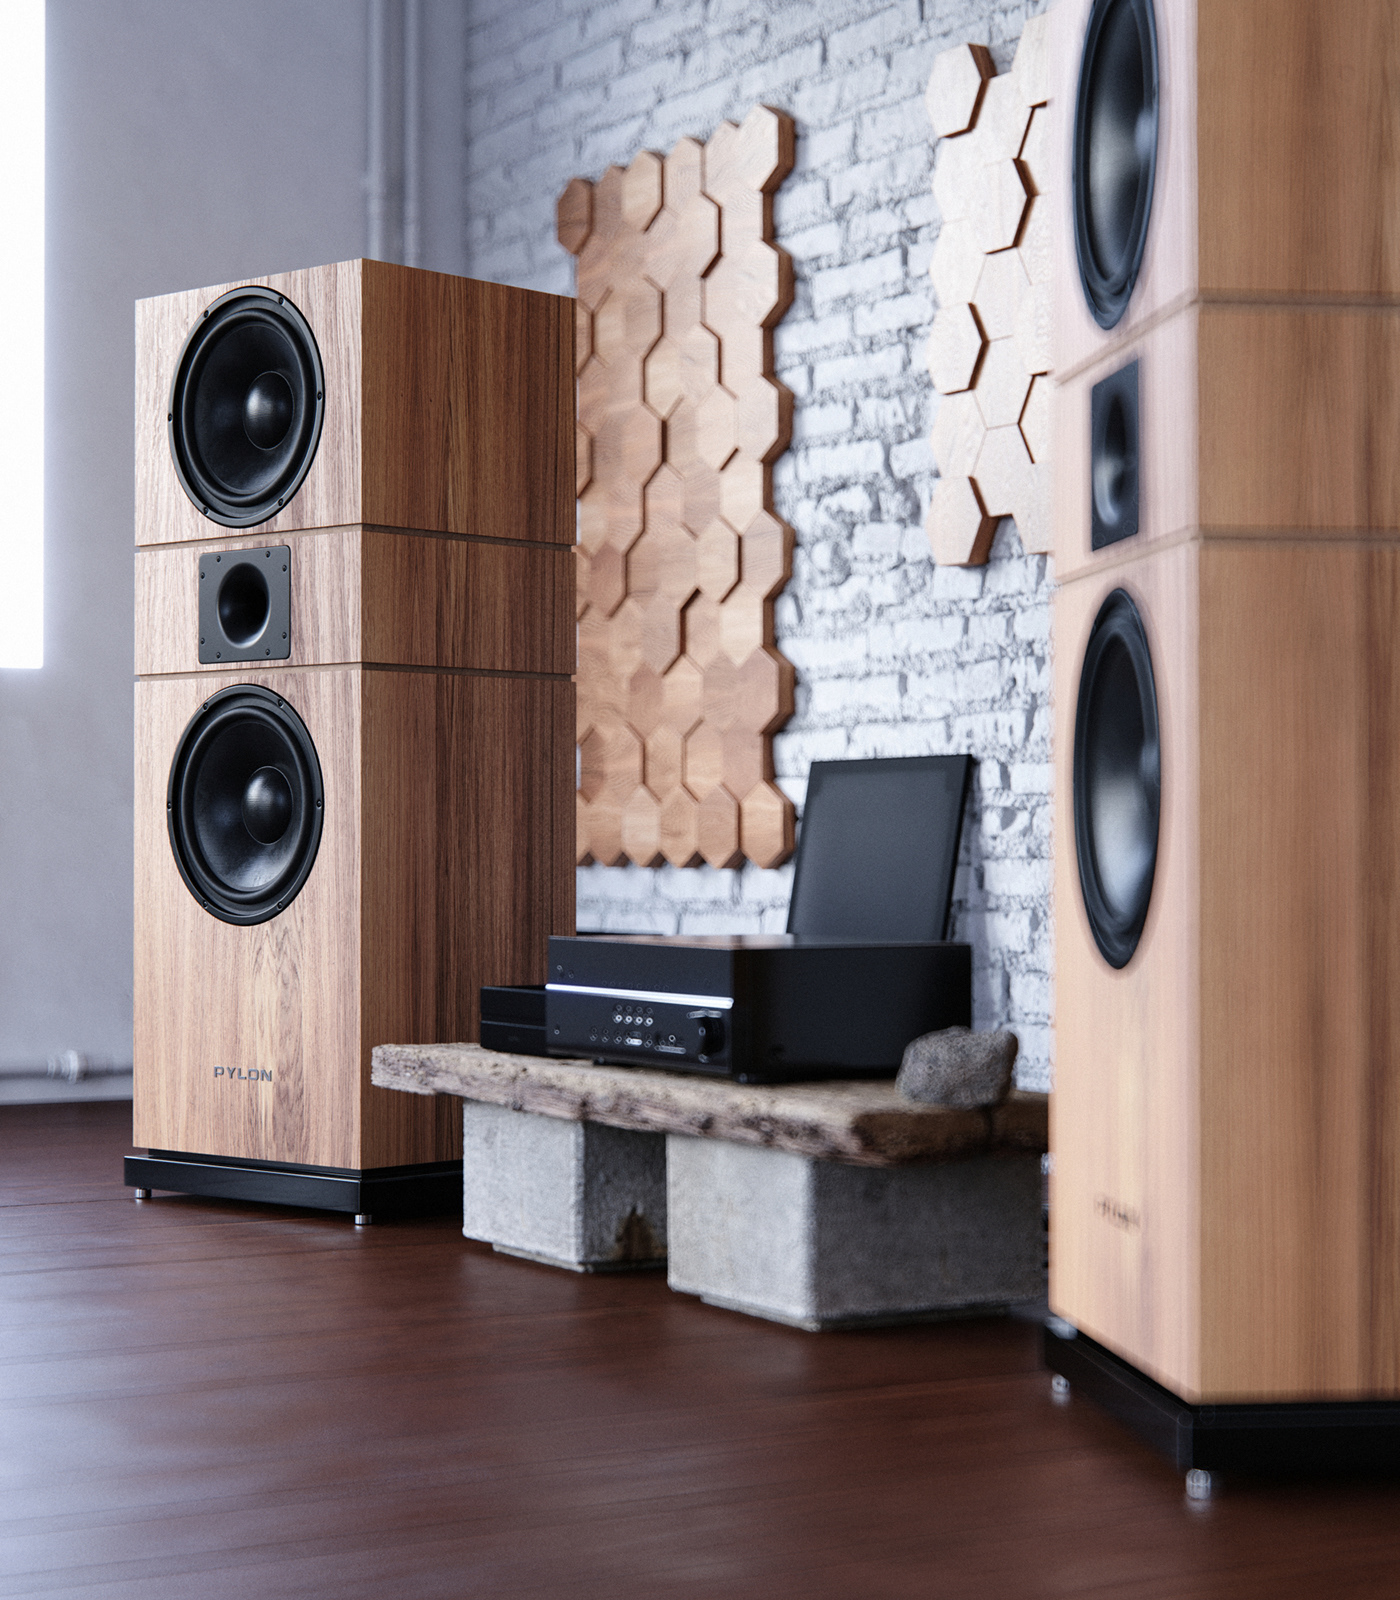 3D 3dsmax Audio audiophile corona hiend loudspeakers product speakers viz